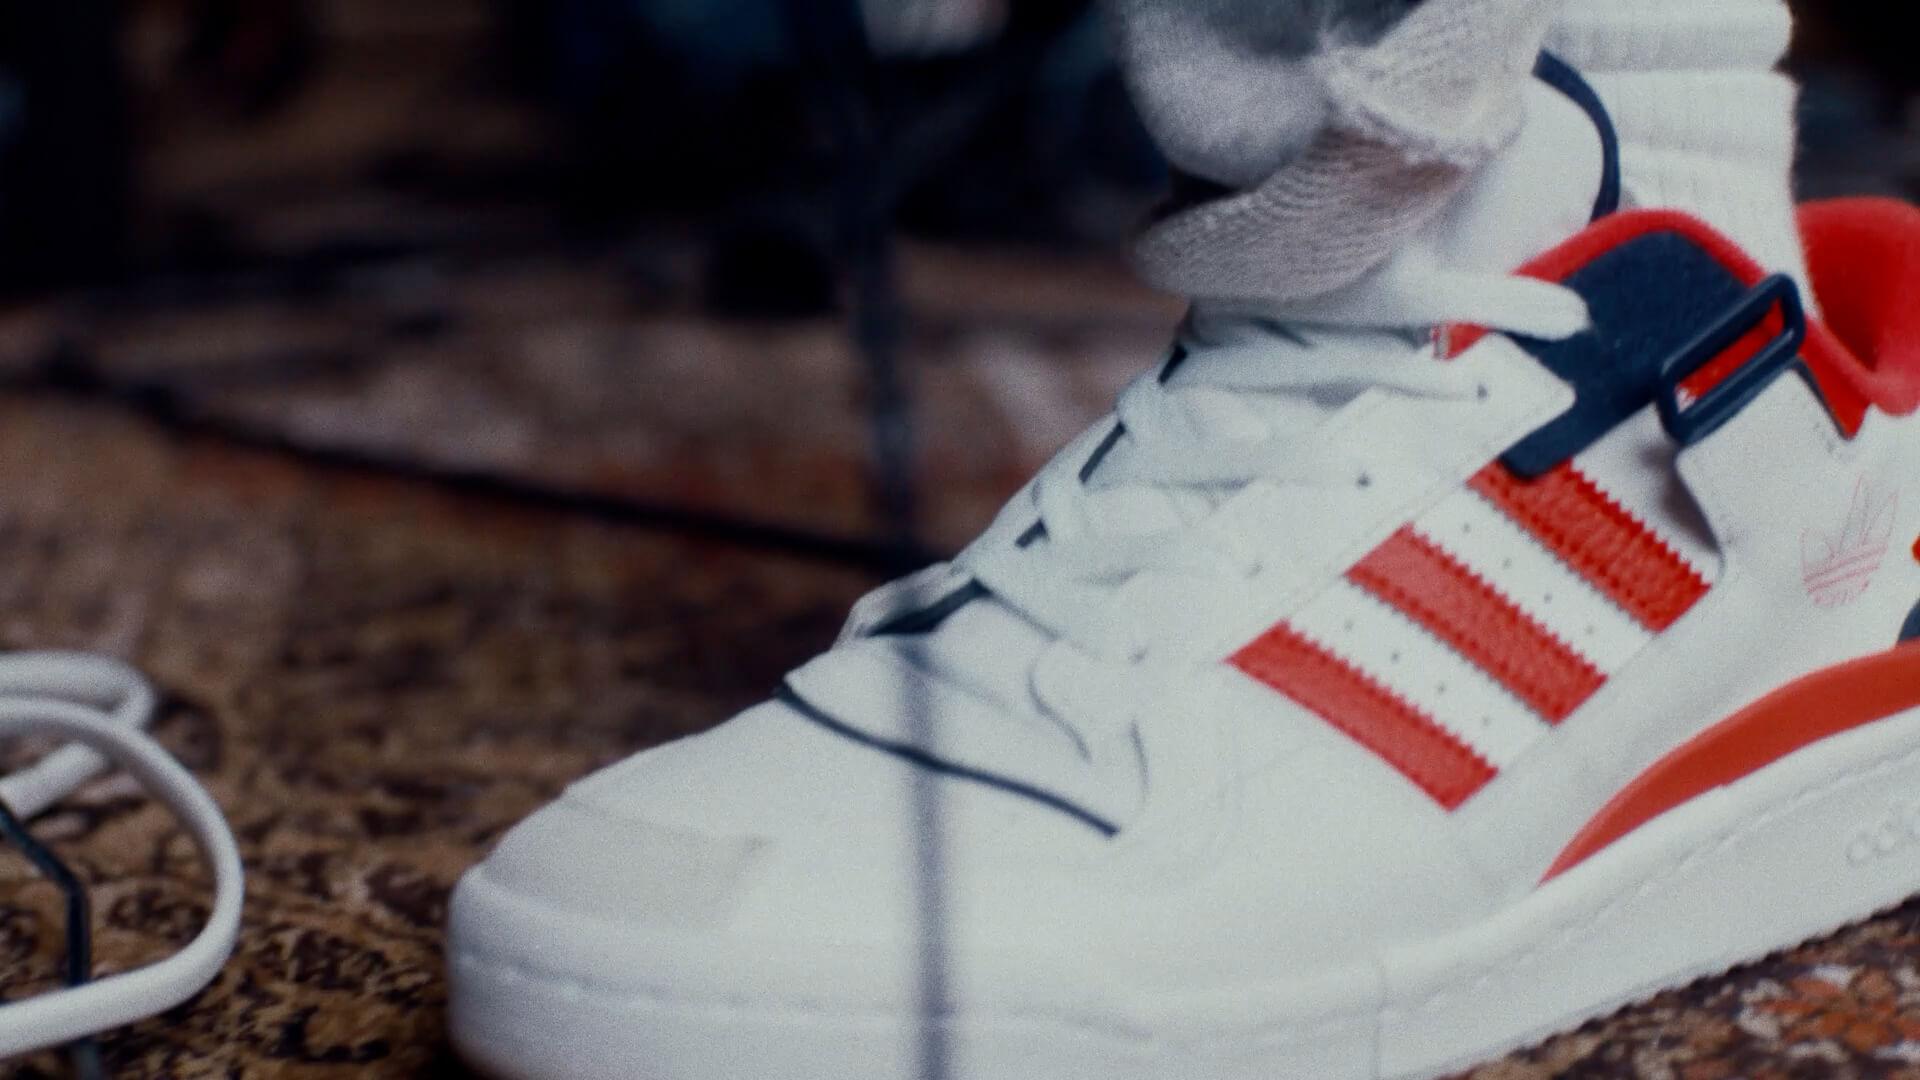 adidas Originals『FORUM』のプロモーションフィルムが公開!King Gnu常田大希が出演 life210716_adidasoriginals_forum_7